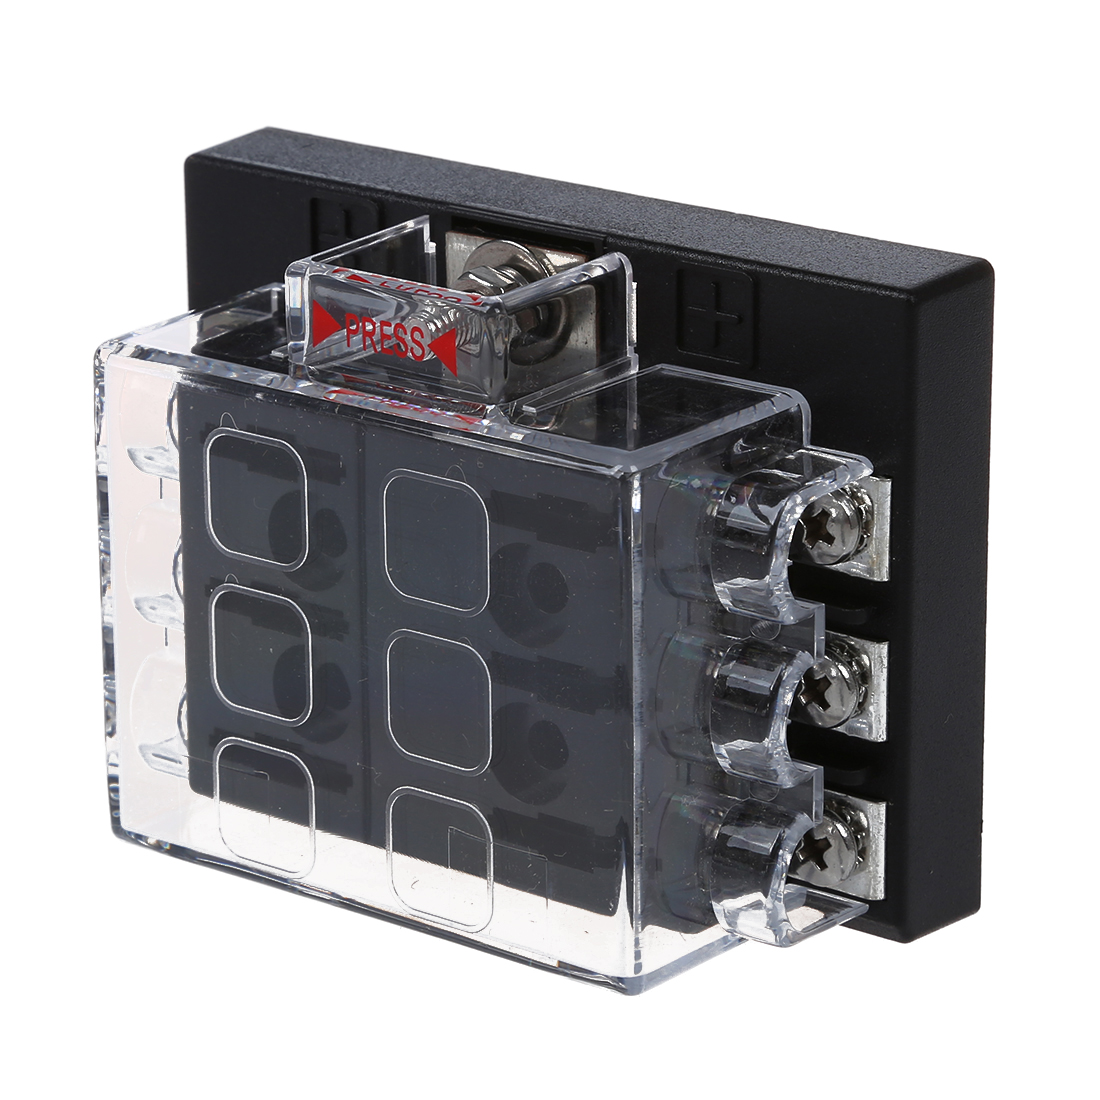 medium resolution of fuse holder box case plug for car autos 6 places